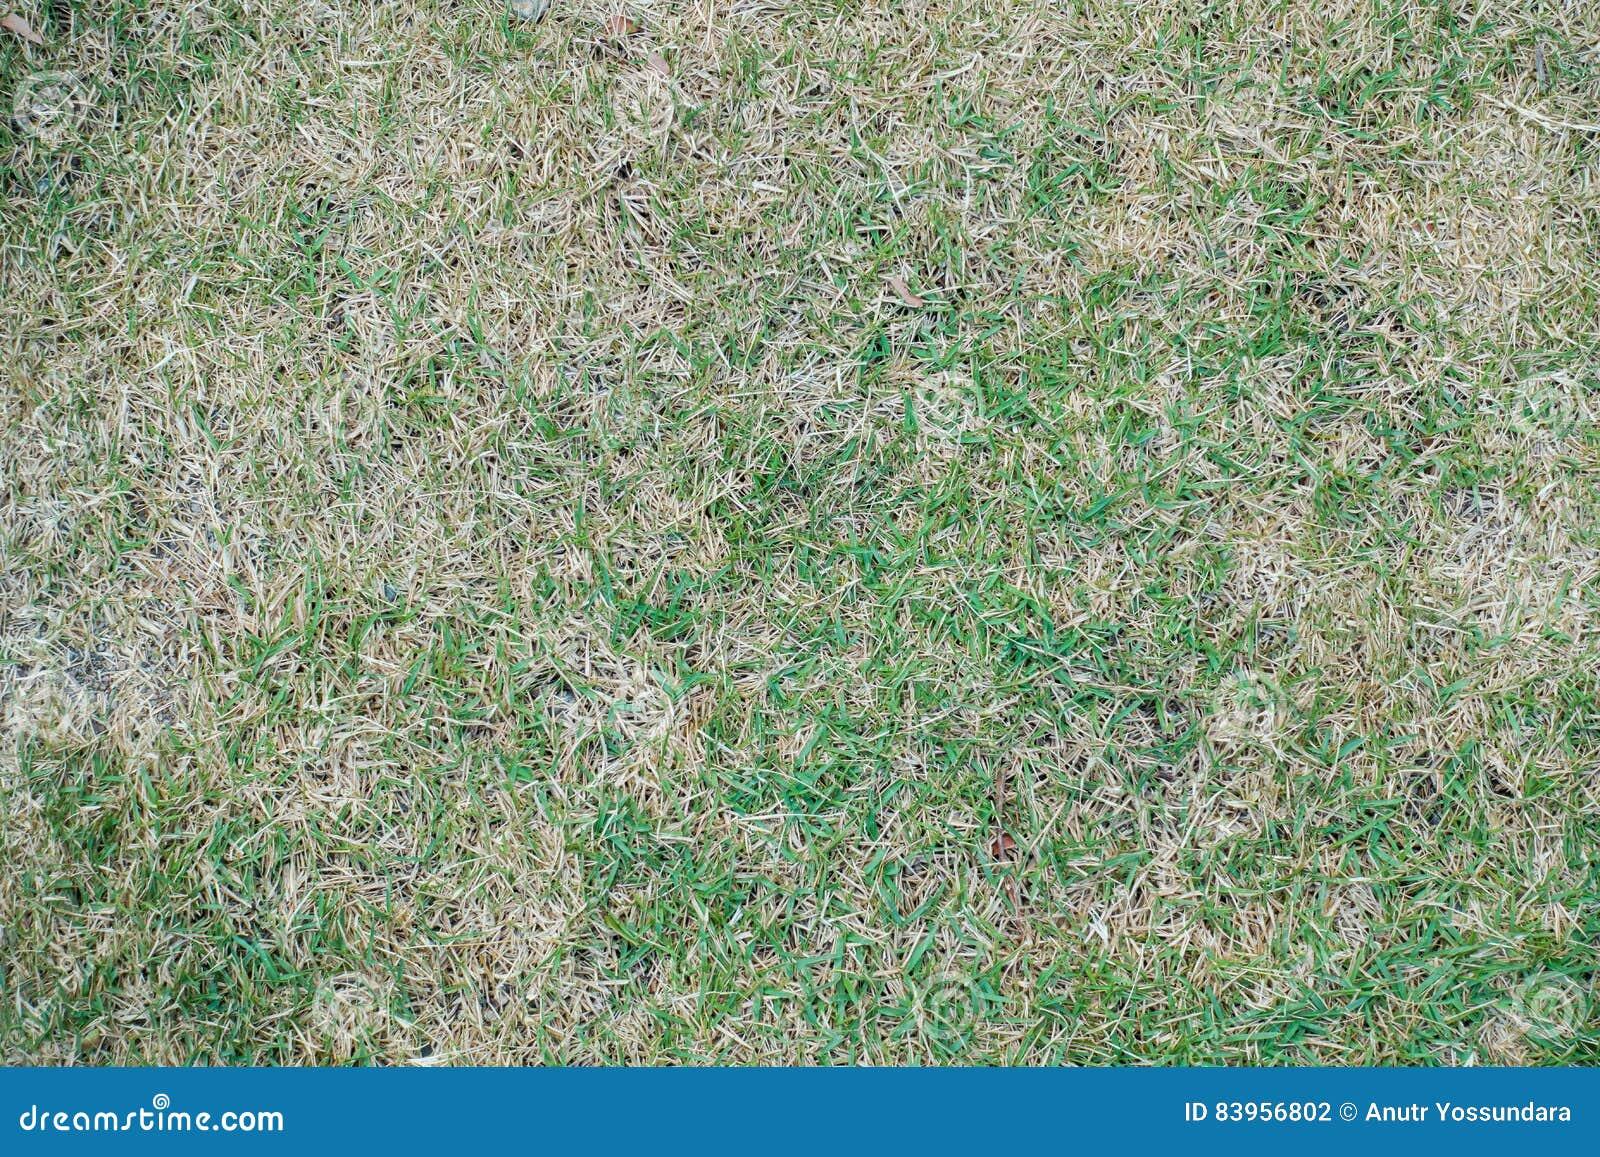 dry grass field background. Dry Grass Field Ground For Texture Background. Background G